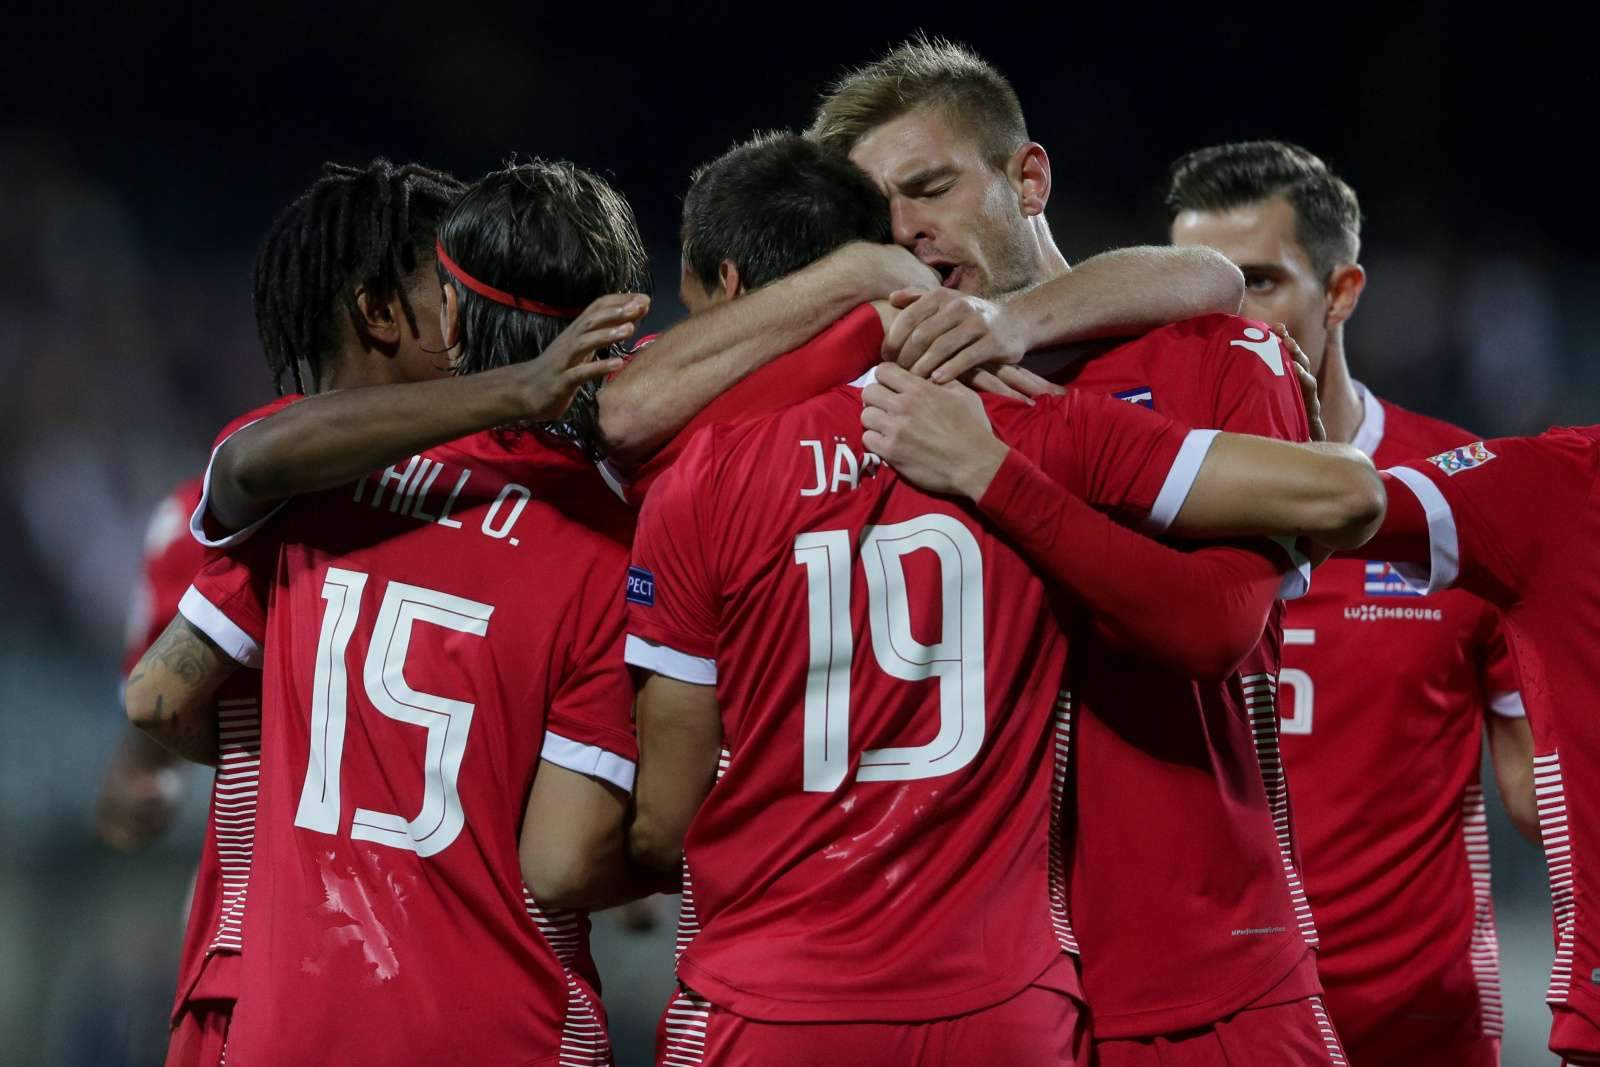 Люксембург – Азербайджан: прогноз на матч отборочного цикла чемпионата мира-2022 - 1 сентября 2021